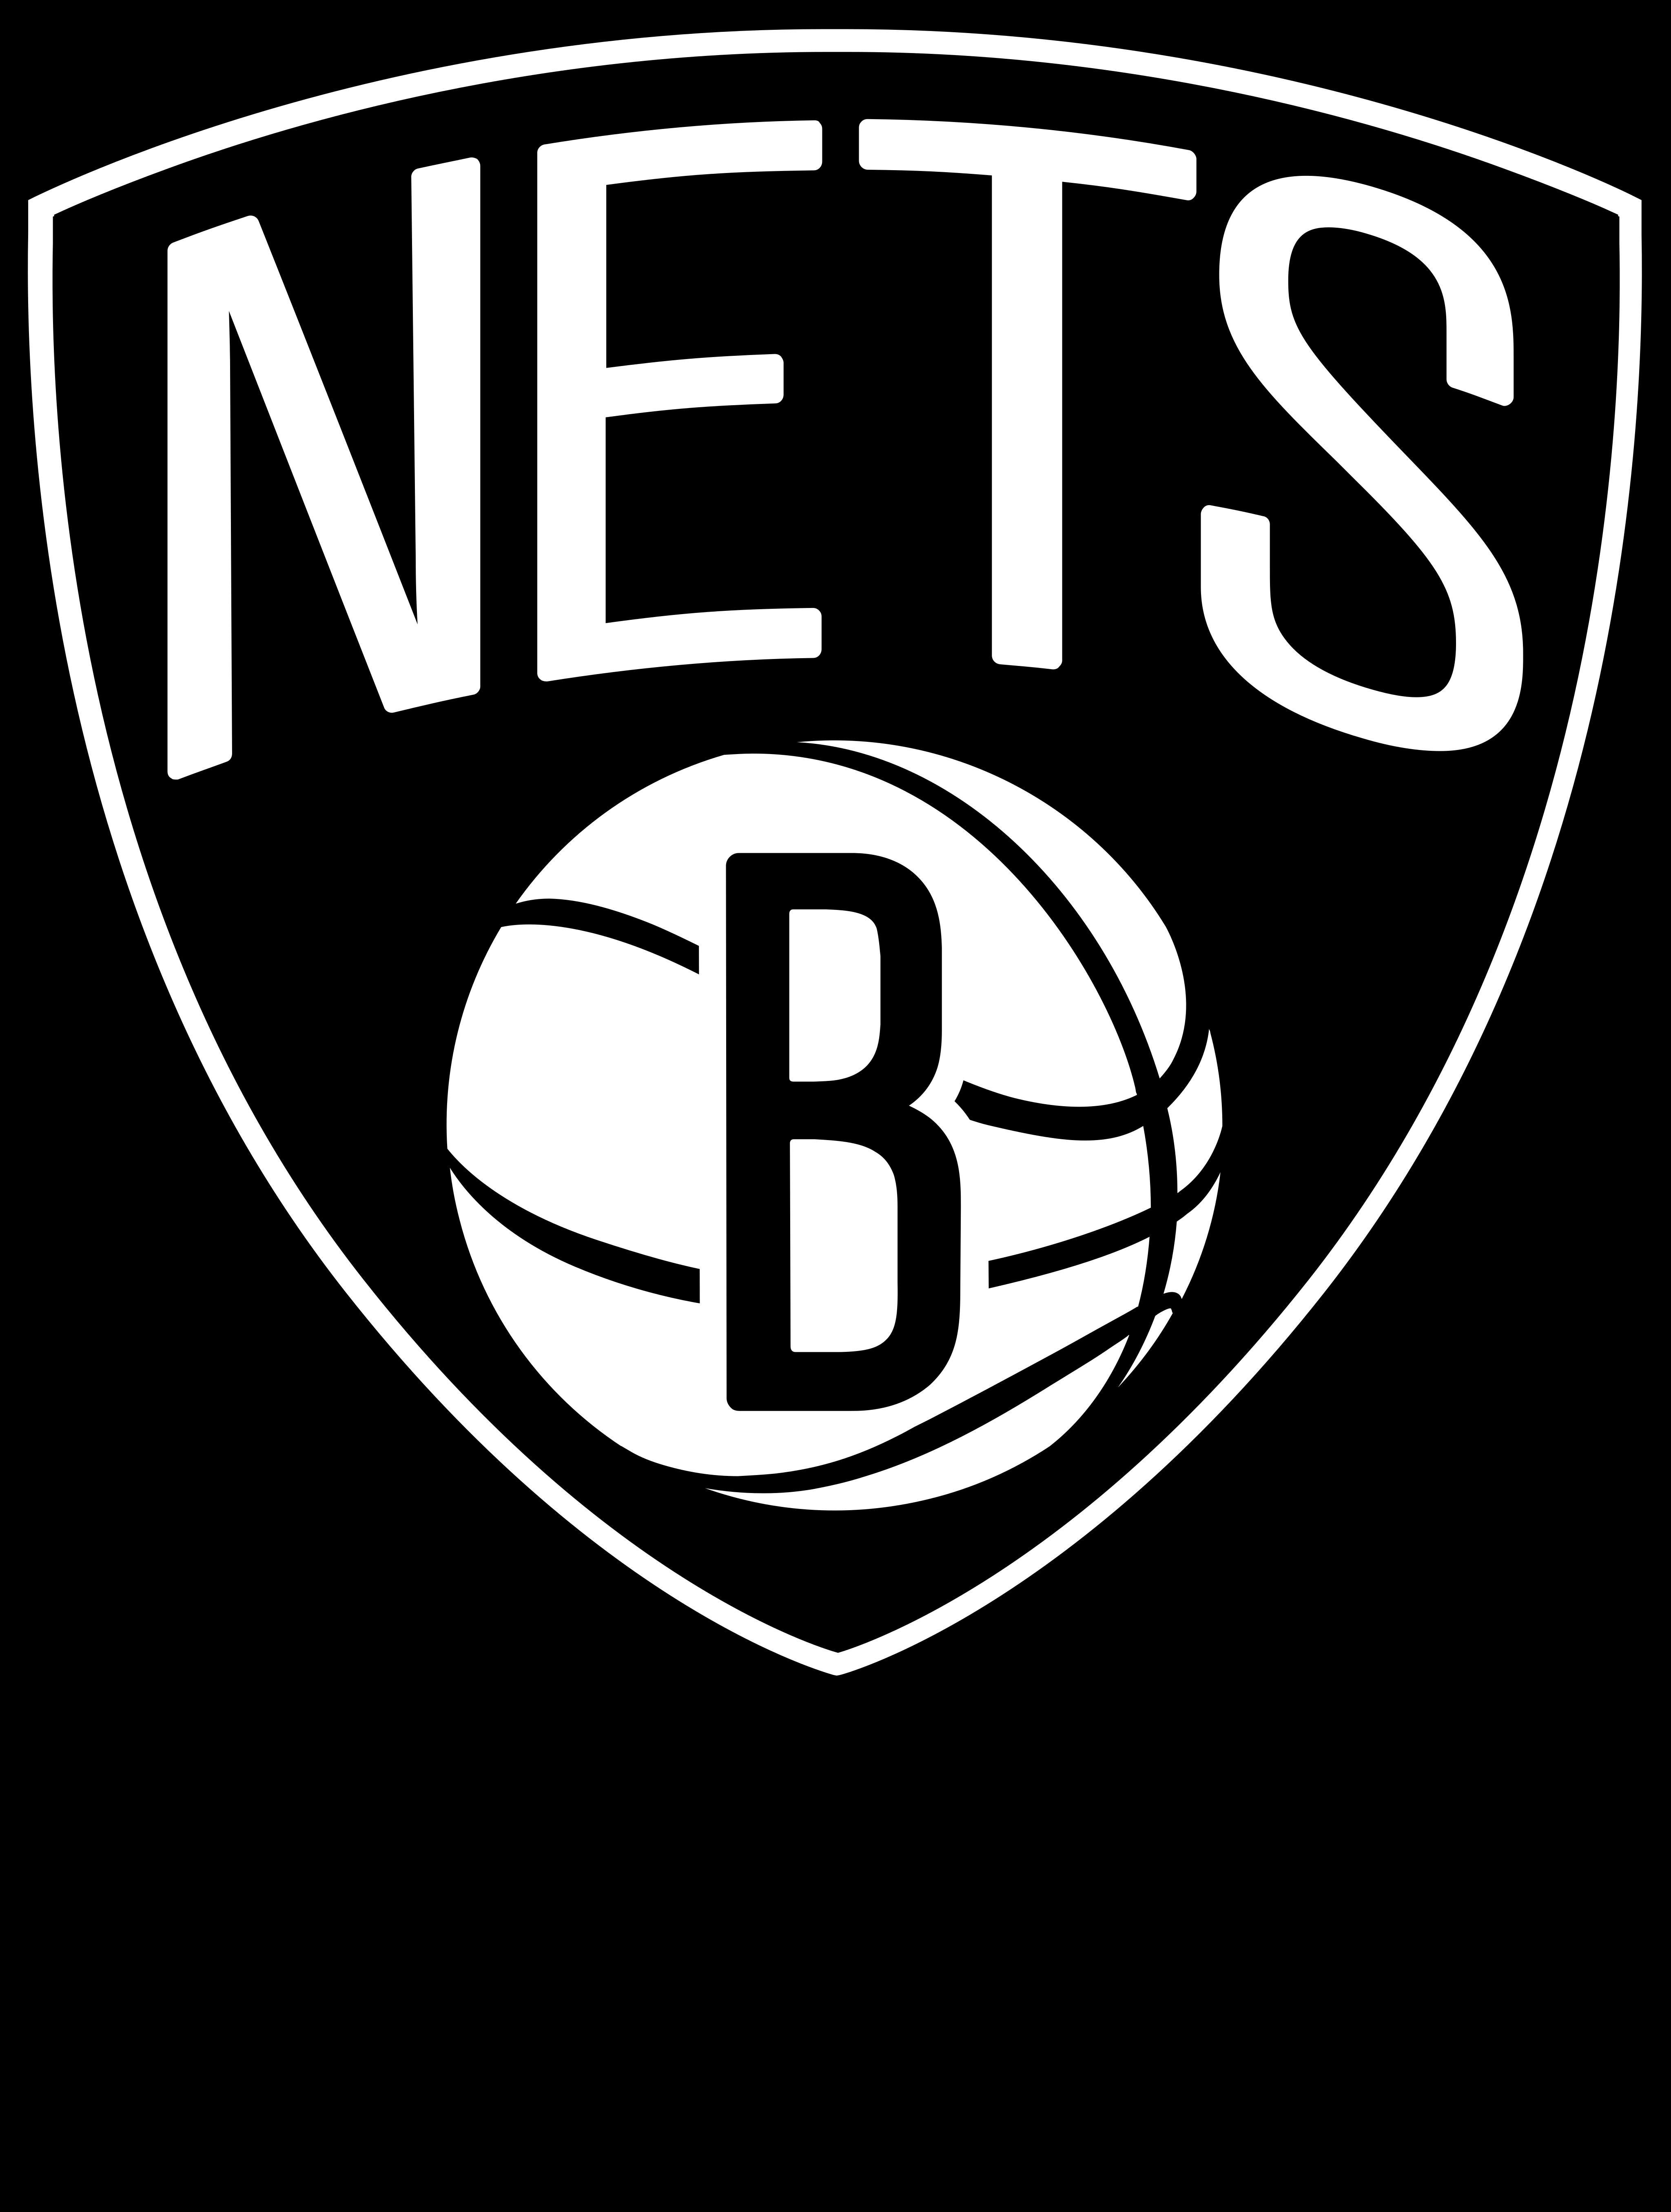 brooklyn nets logo 1 - Brooklyn Nets Logo